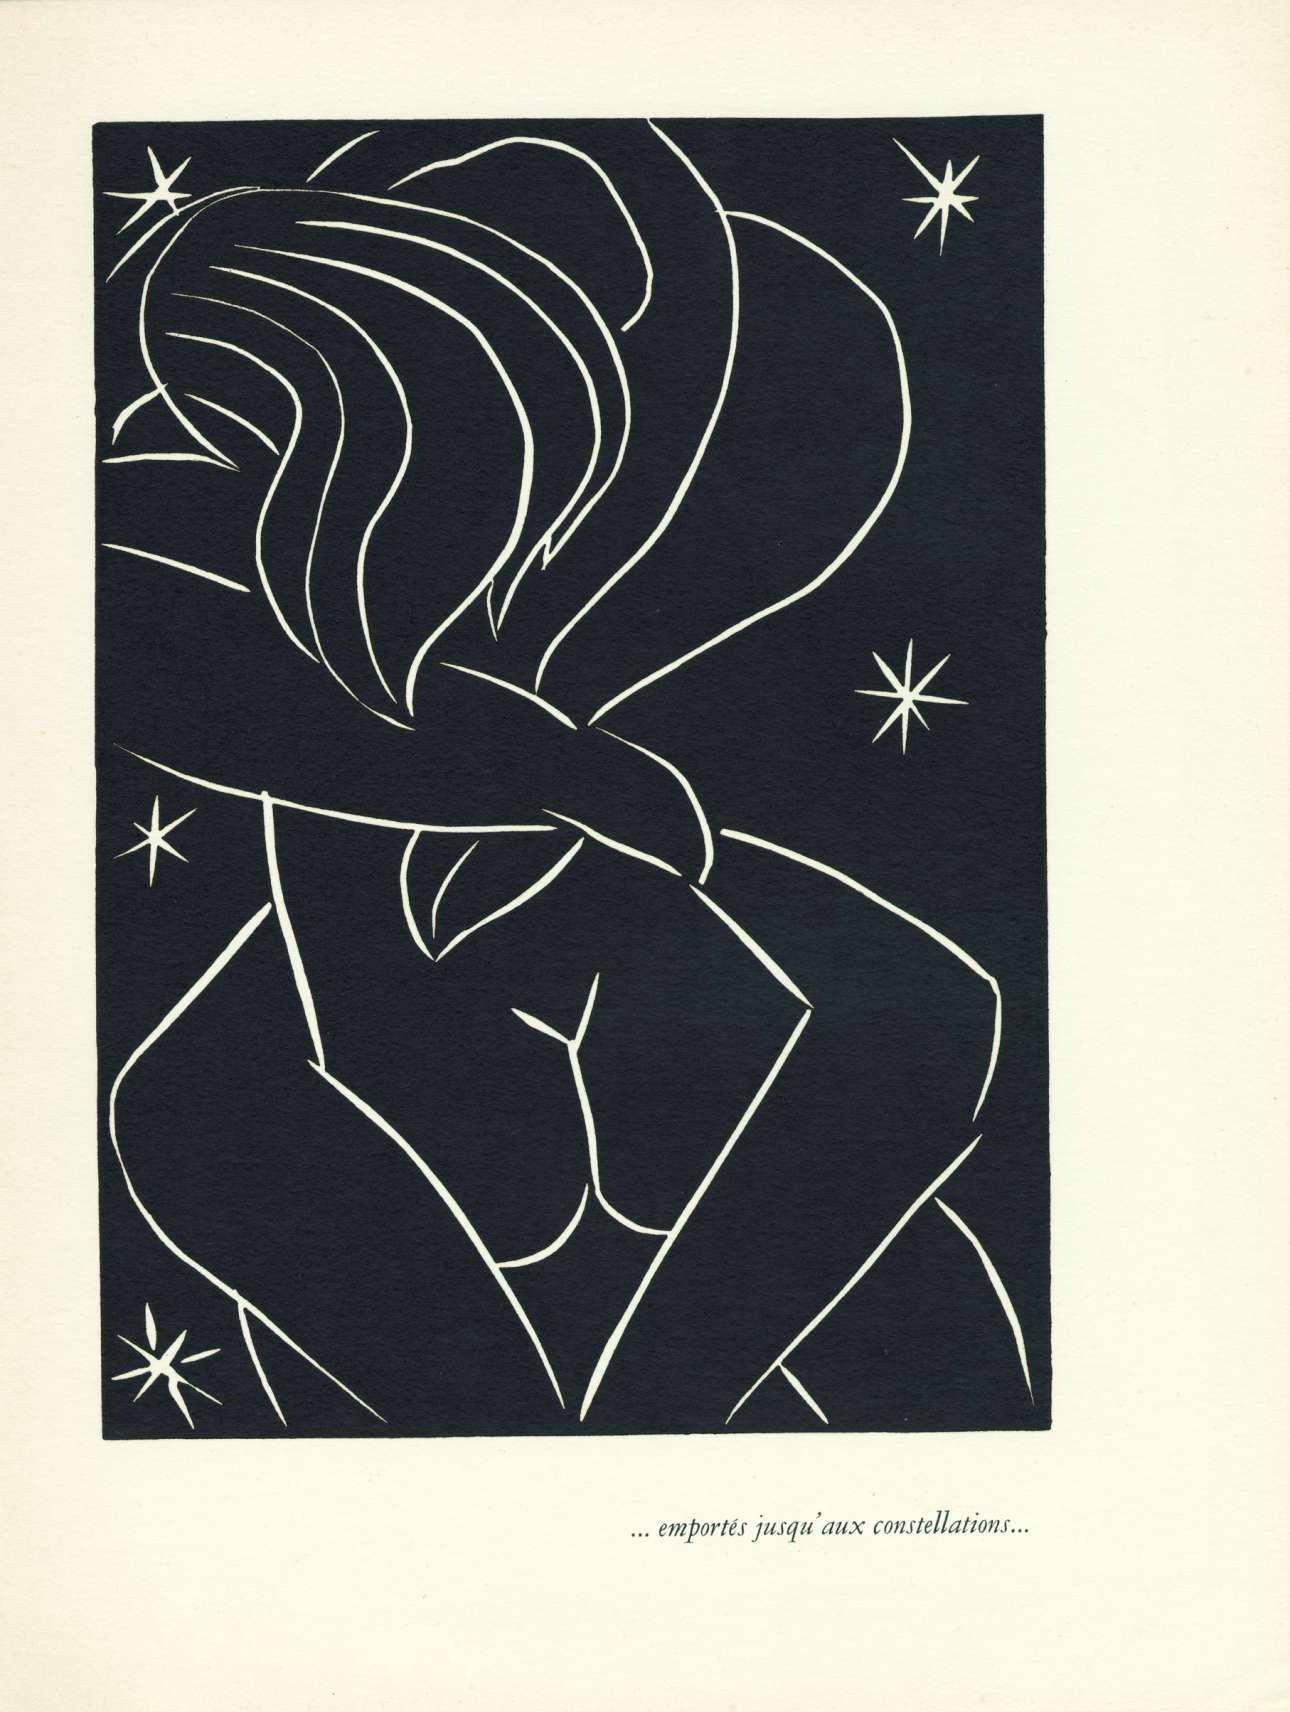 Henri Matisse, «Emportés jusqu'aux constellations», 1944. Ενα ζευγάρι ερωτοτροπεί ανάμεσα στα αστέρια, μία υπέροχη εικονογράφηση του σπουδαίου καλλιτέχνη Ανρί Ματίς